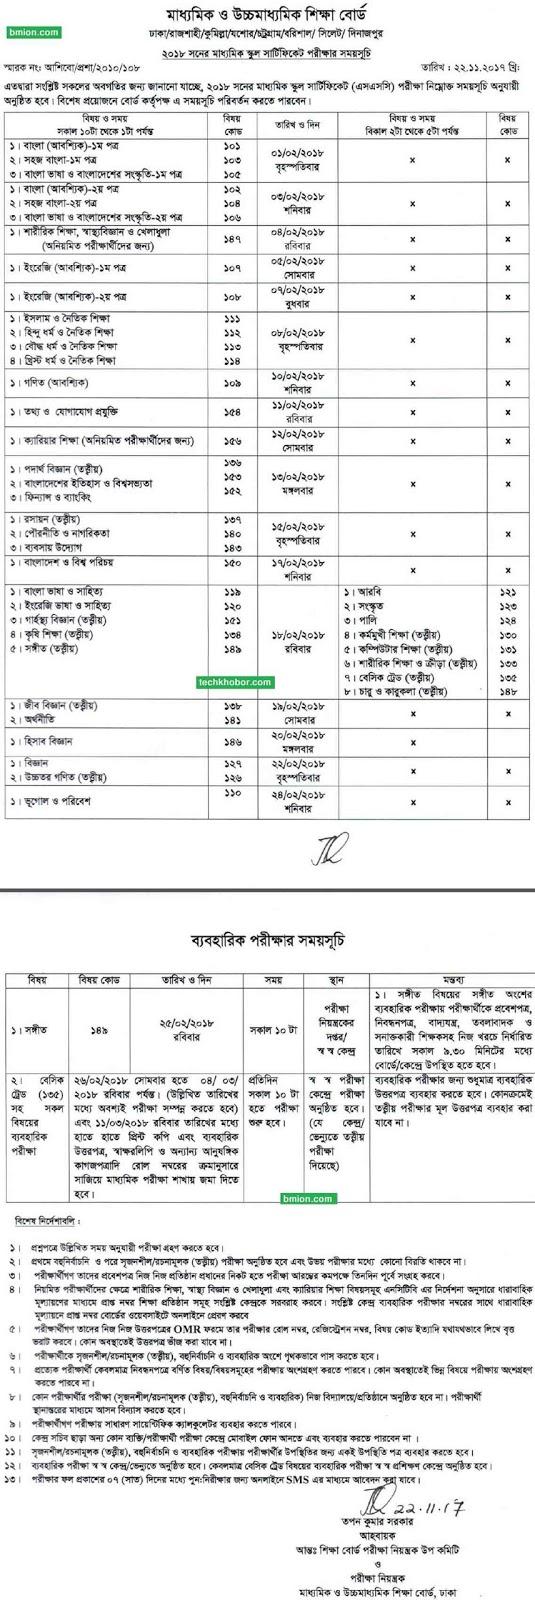 SSC-Exam-Routine-2018-Starts-1-February-2018